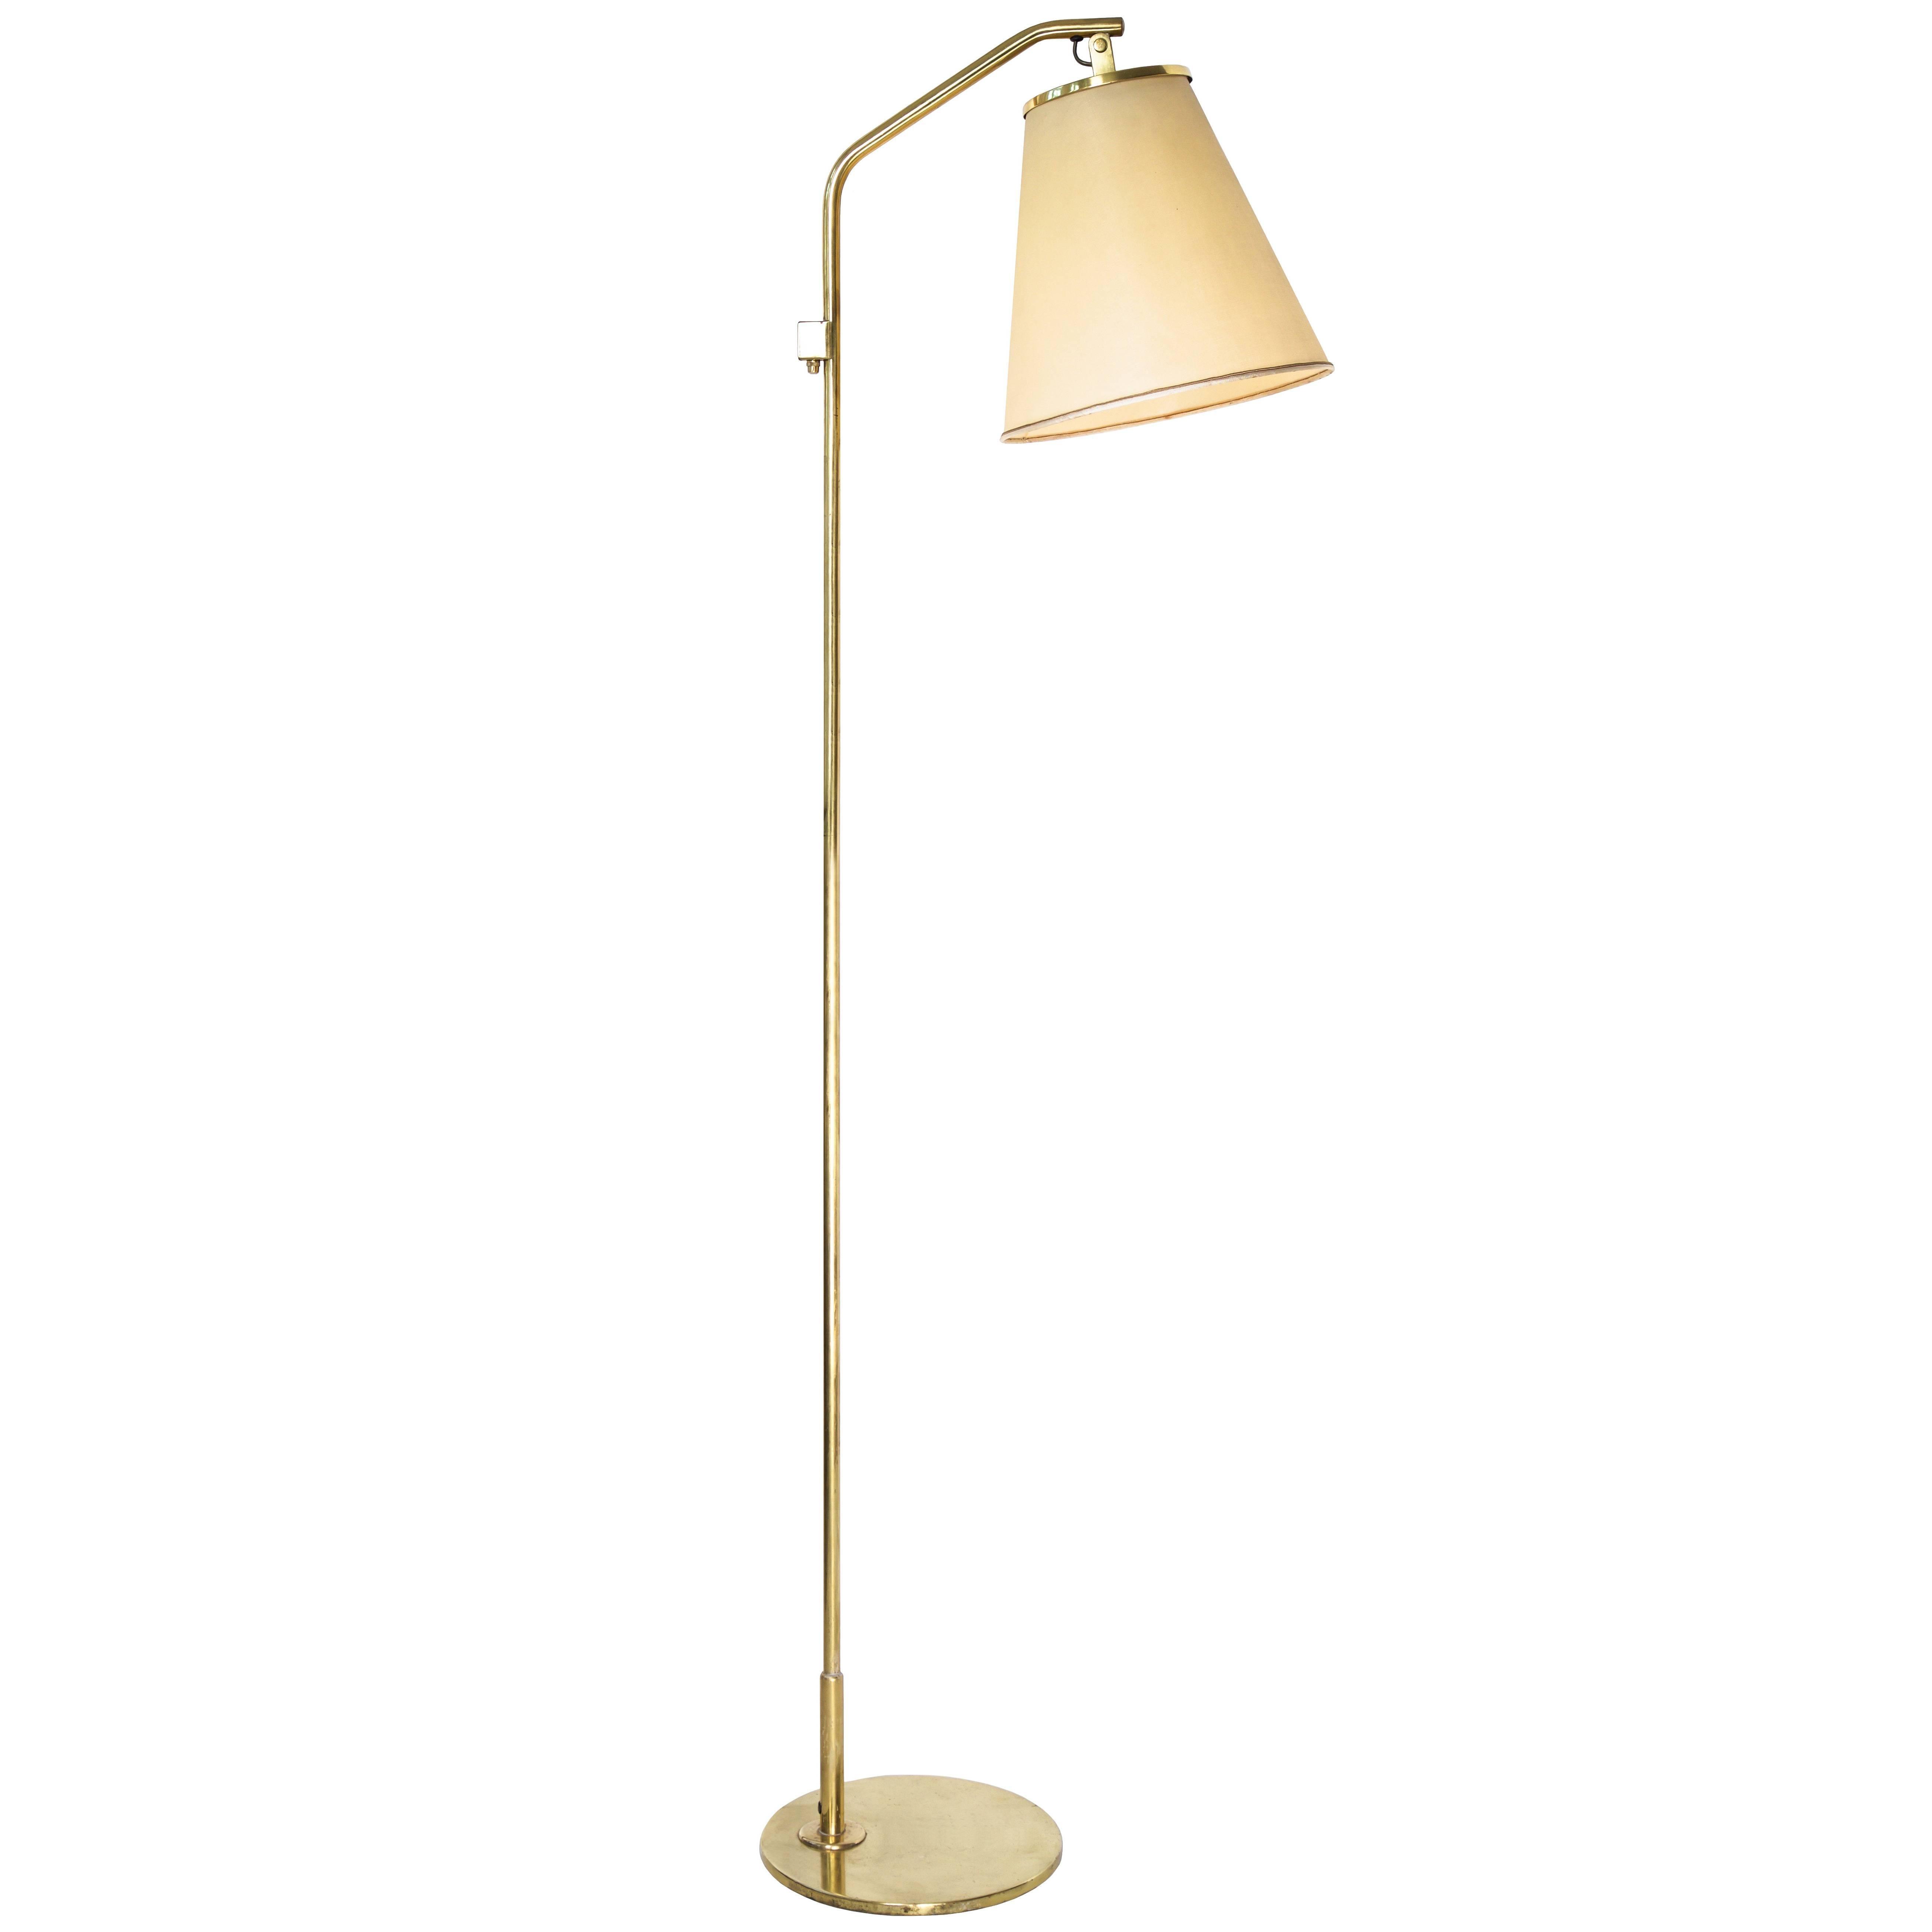 Paavo Tynell Floor Lamp Model 9613, Taito Oy, 1940s